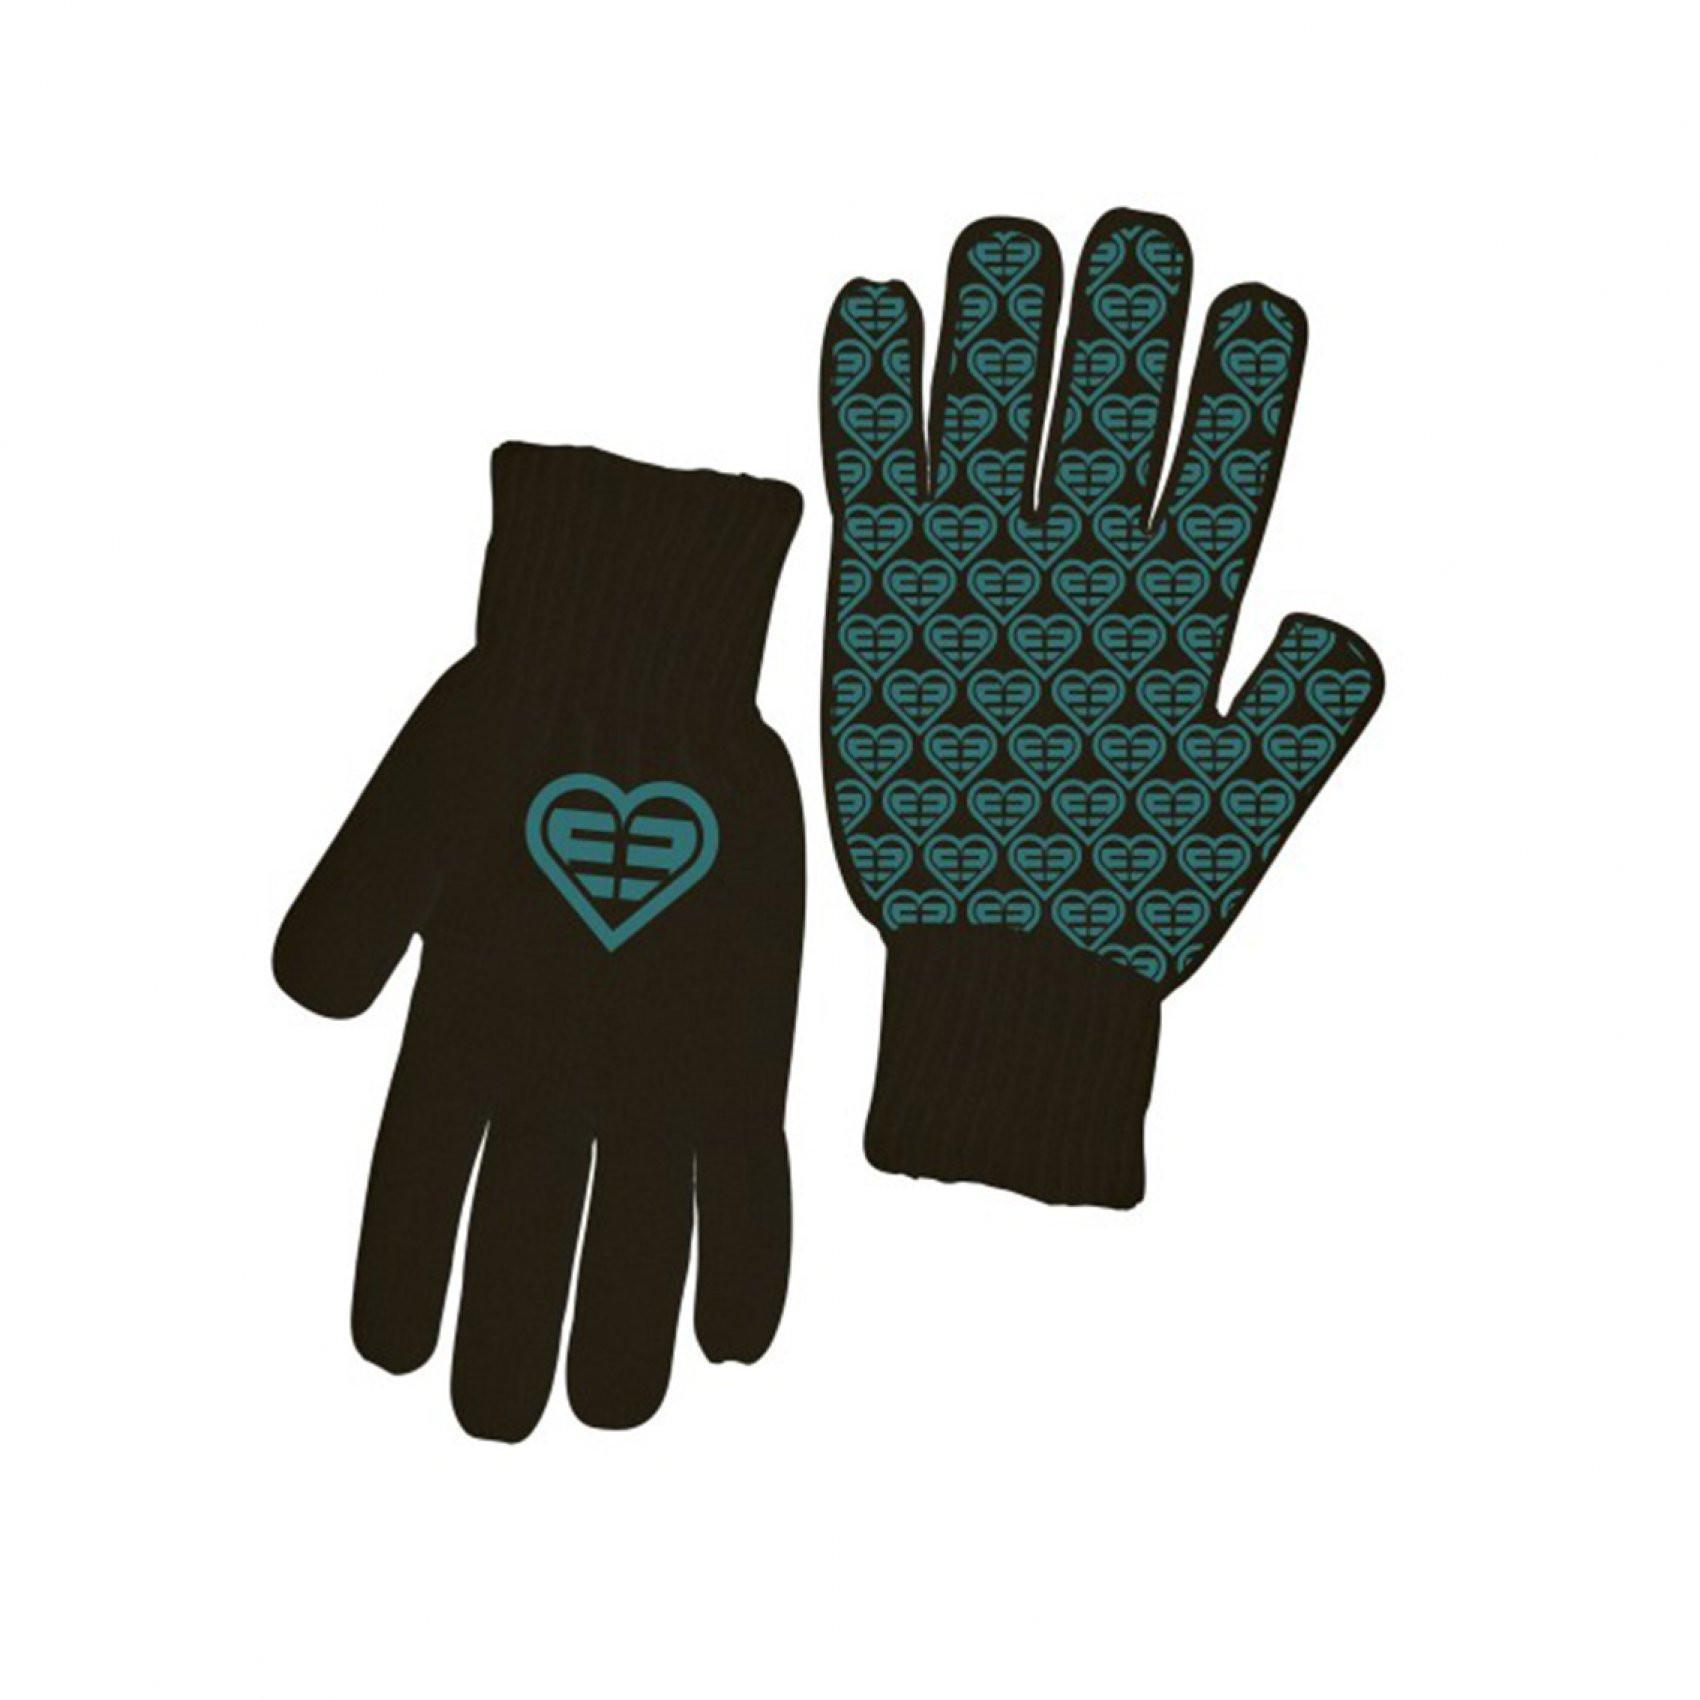 Paire de gants femme logo bleu freegun (photo)